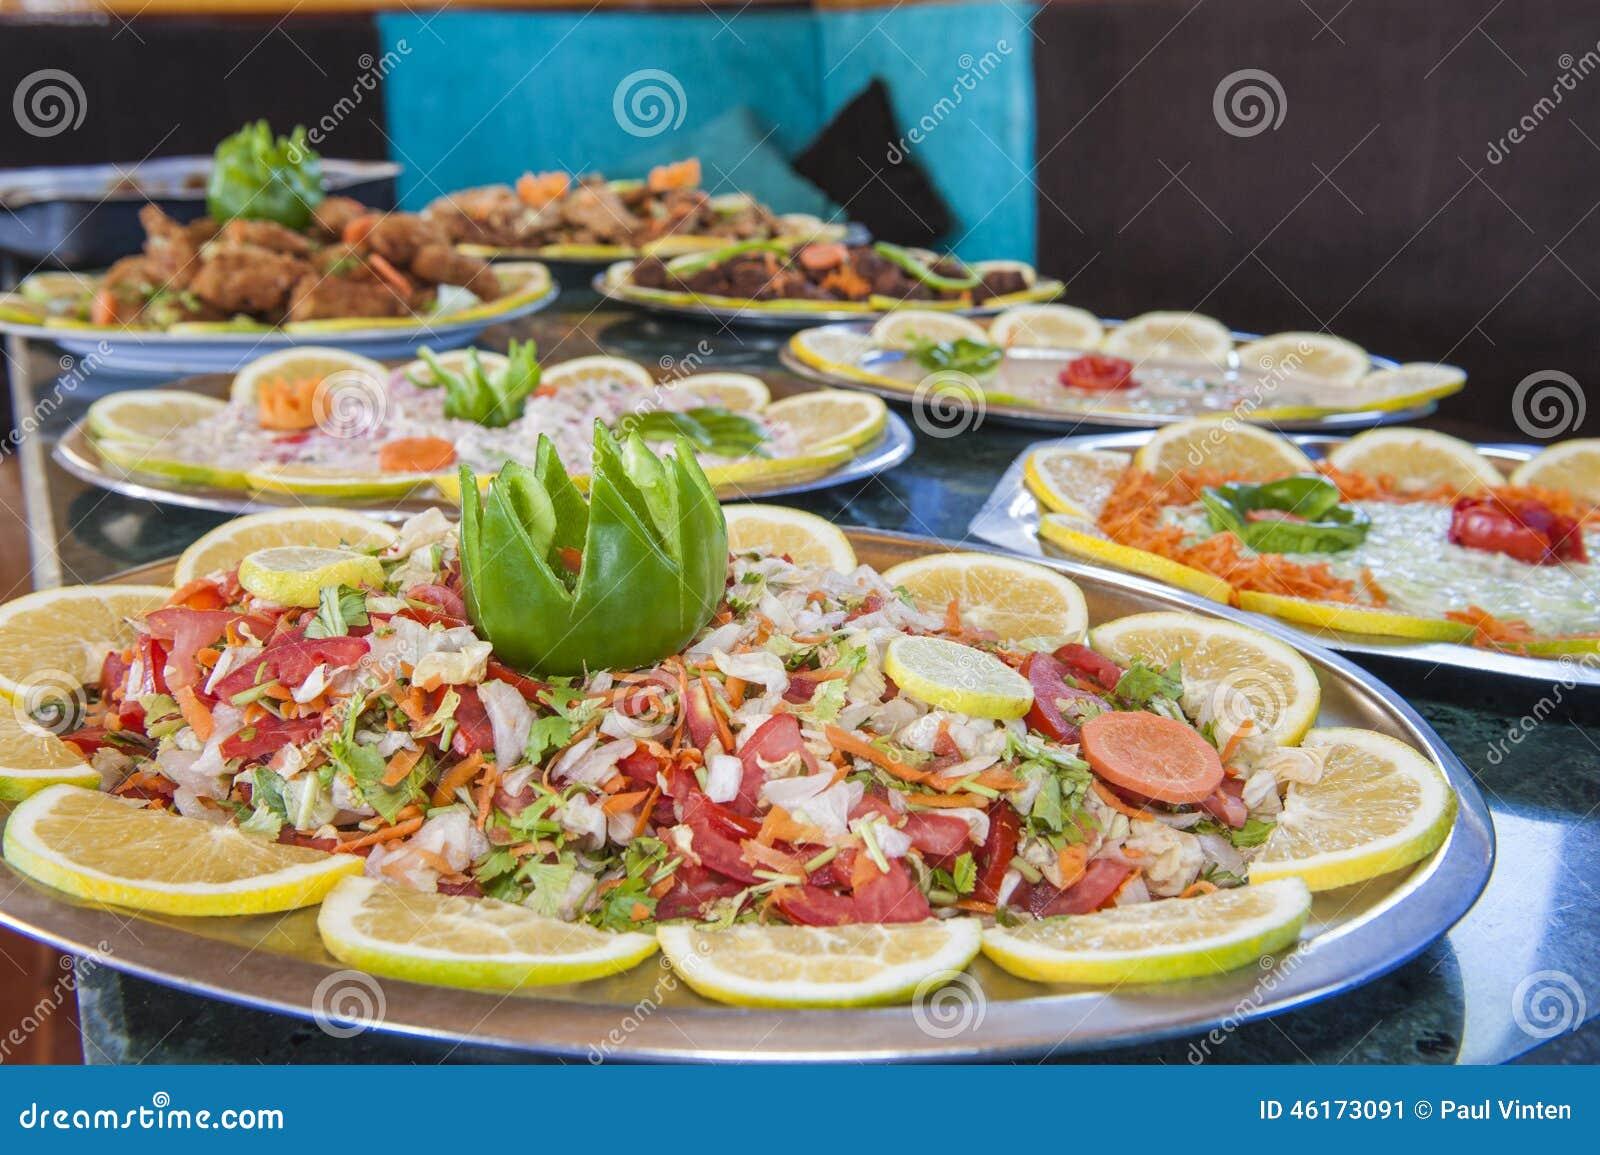 Genial fotos de platos de cocina fotos platos tipicos de for Platos cocina